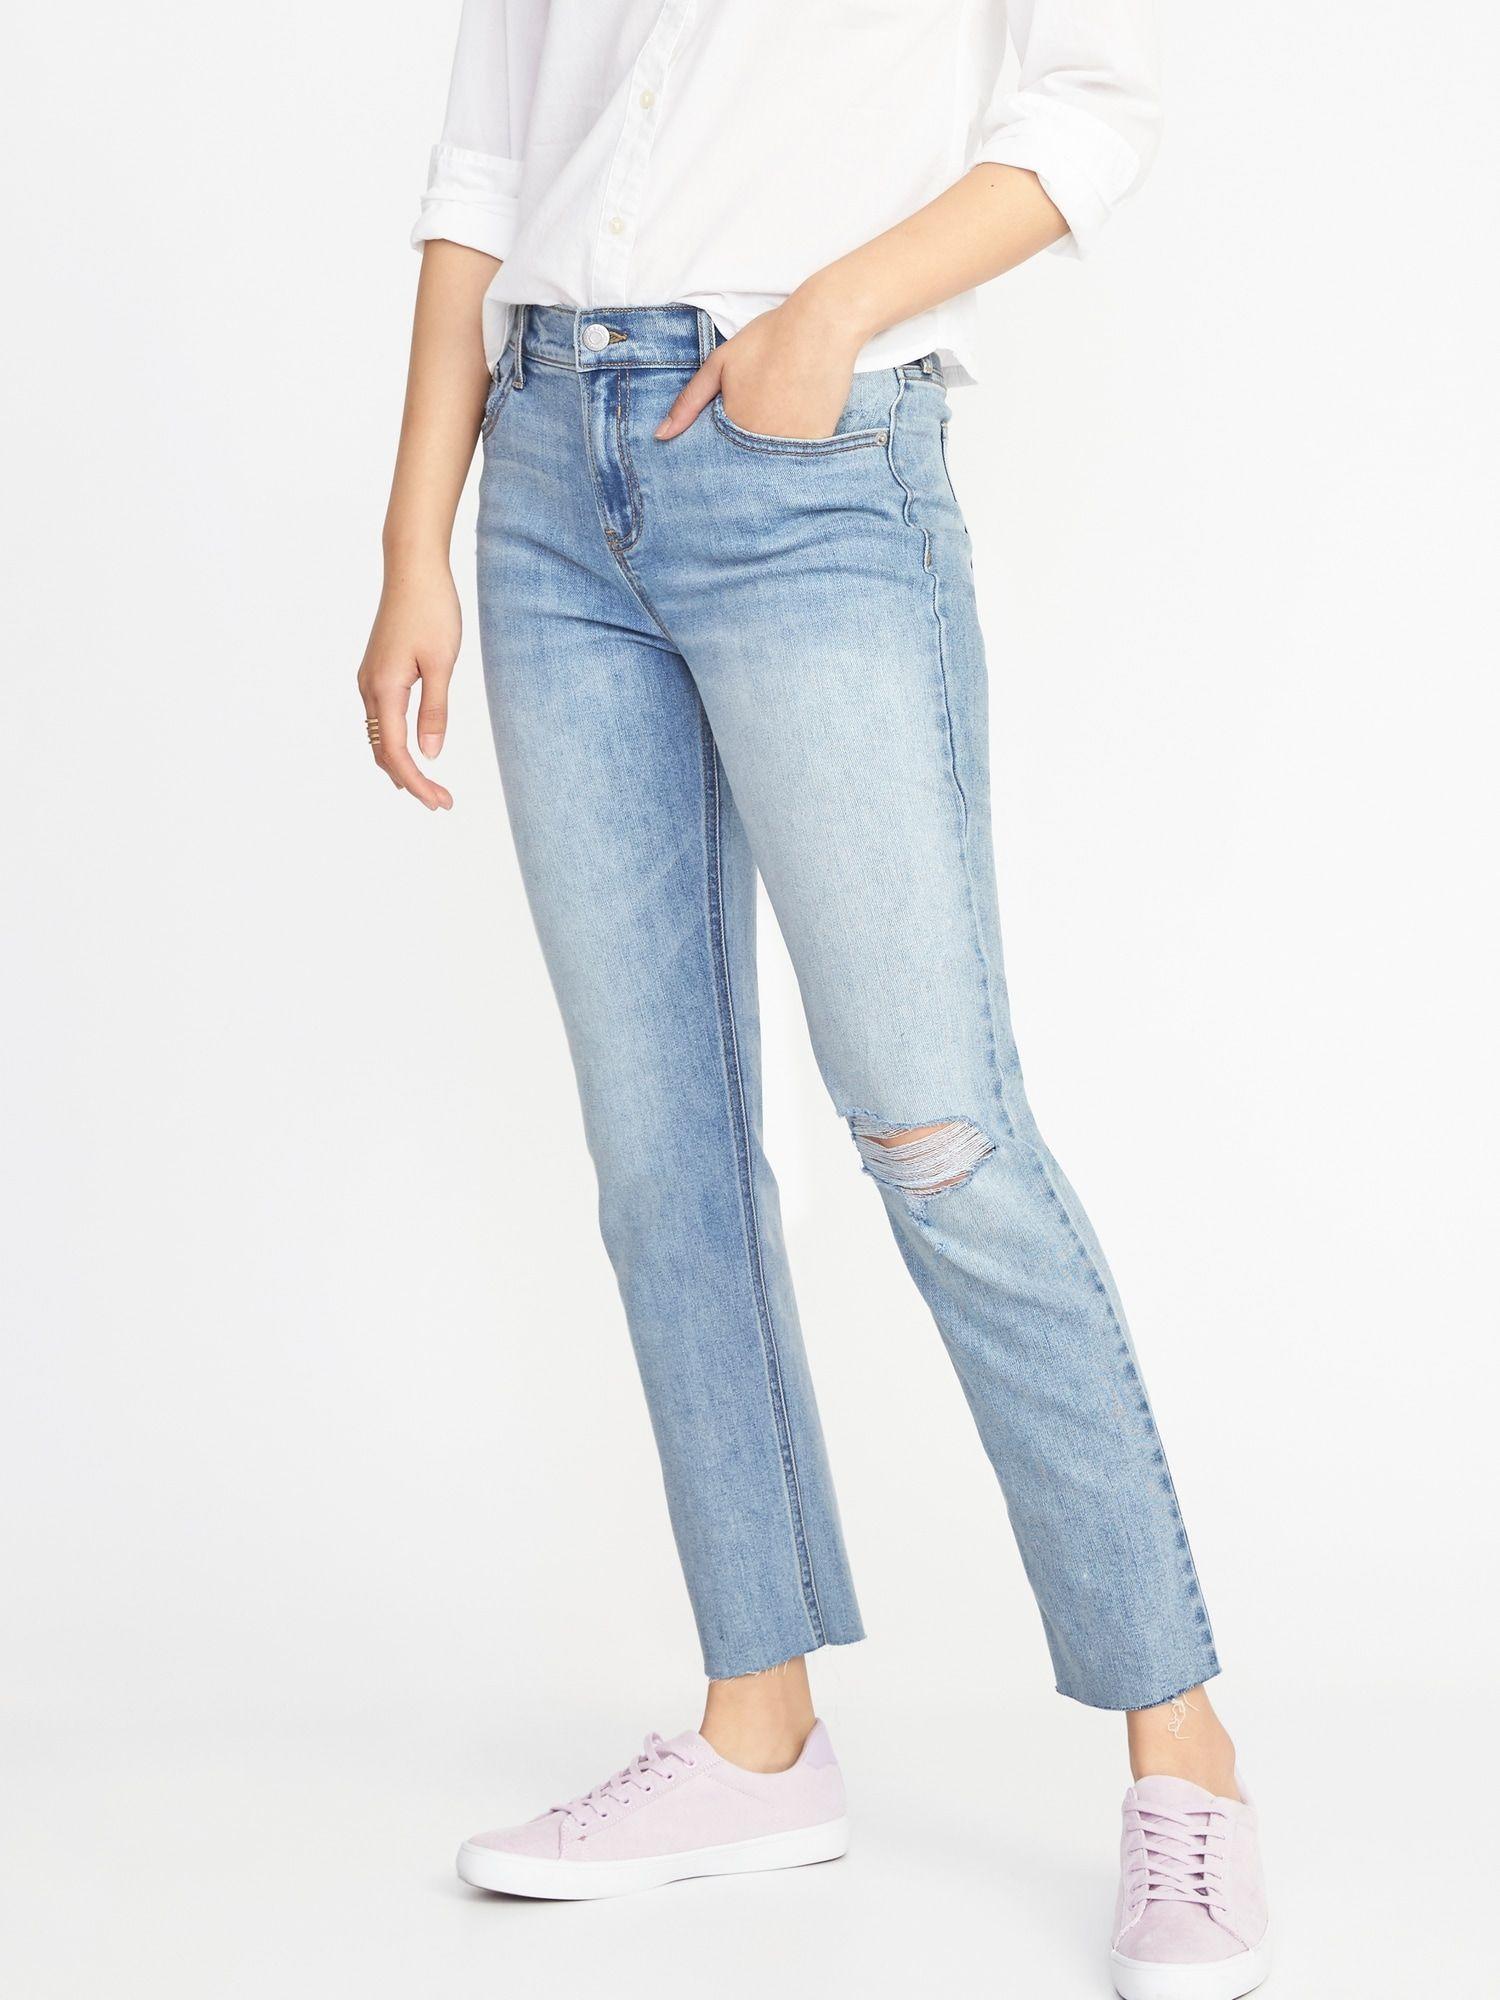 Jeans for the super petite bondagemodels granny webcam